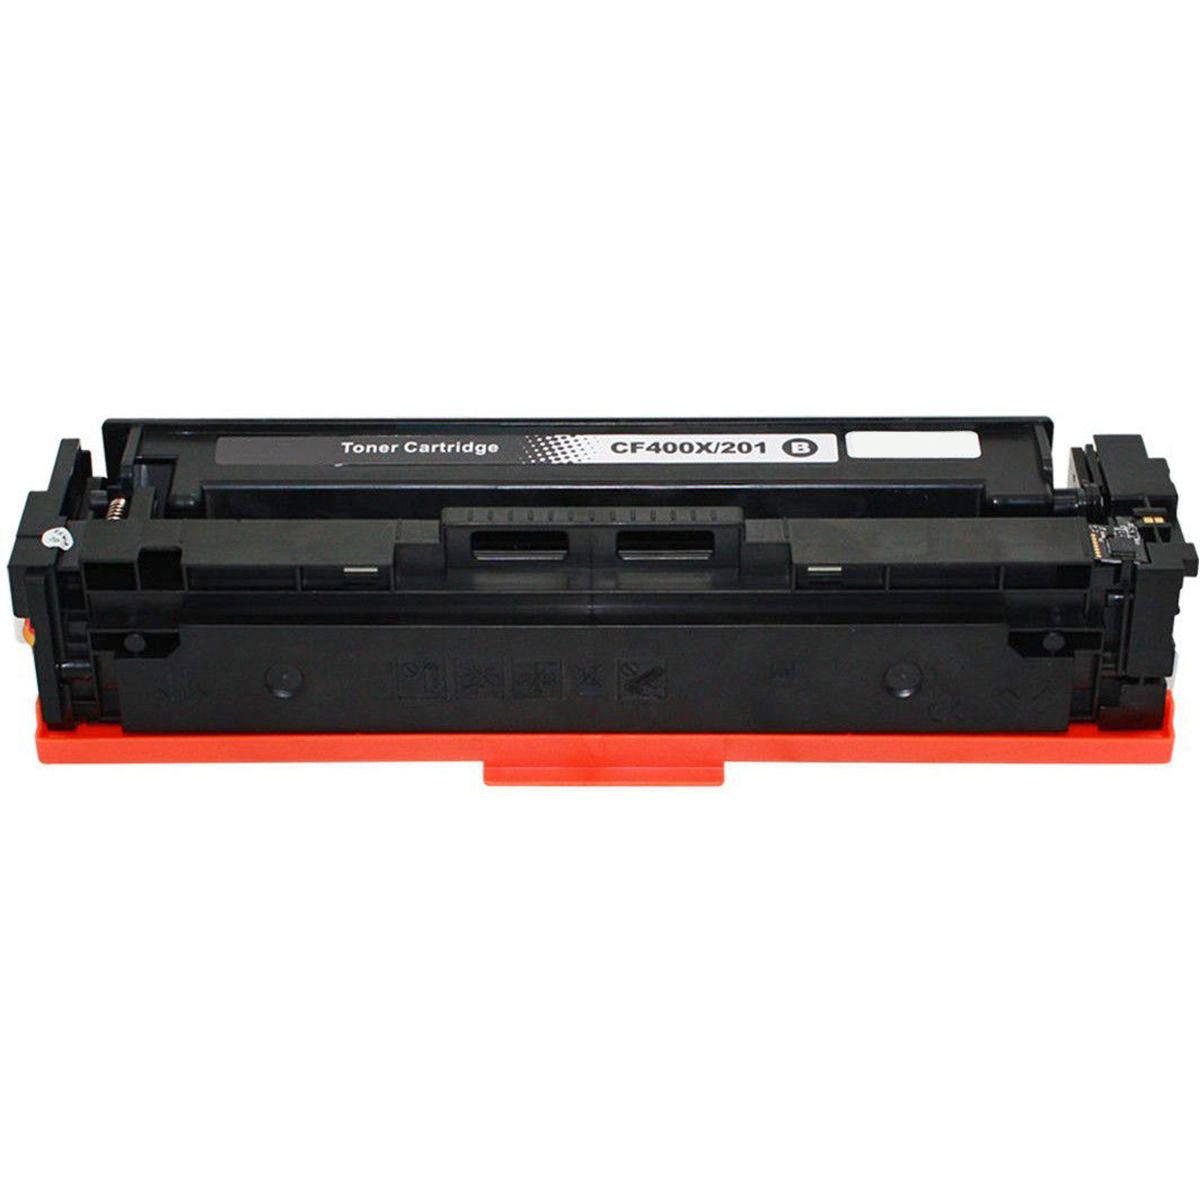 Compatível: Toner CF400X 201X para Impressora HP M252 M252n M252dw M274 M277 M277n M277dw 252dw 277dw / Preto / 2.800